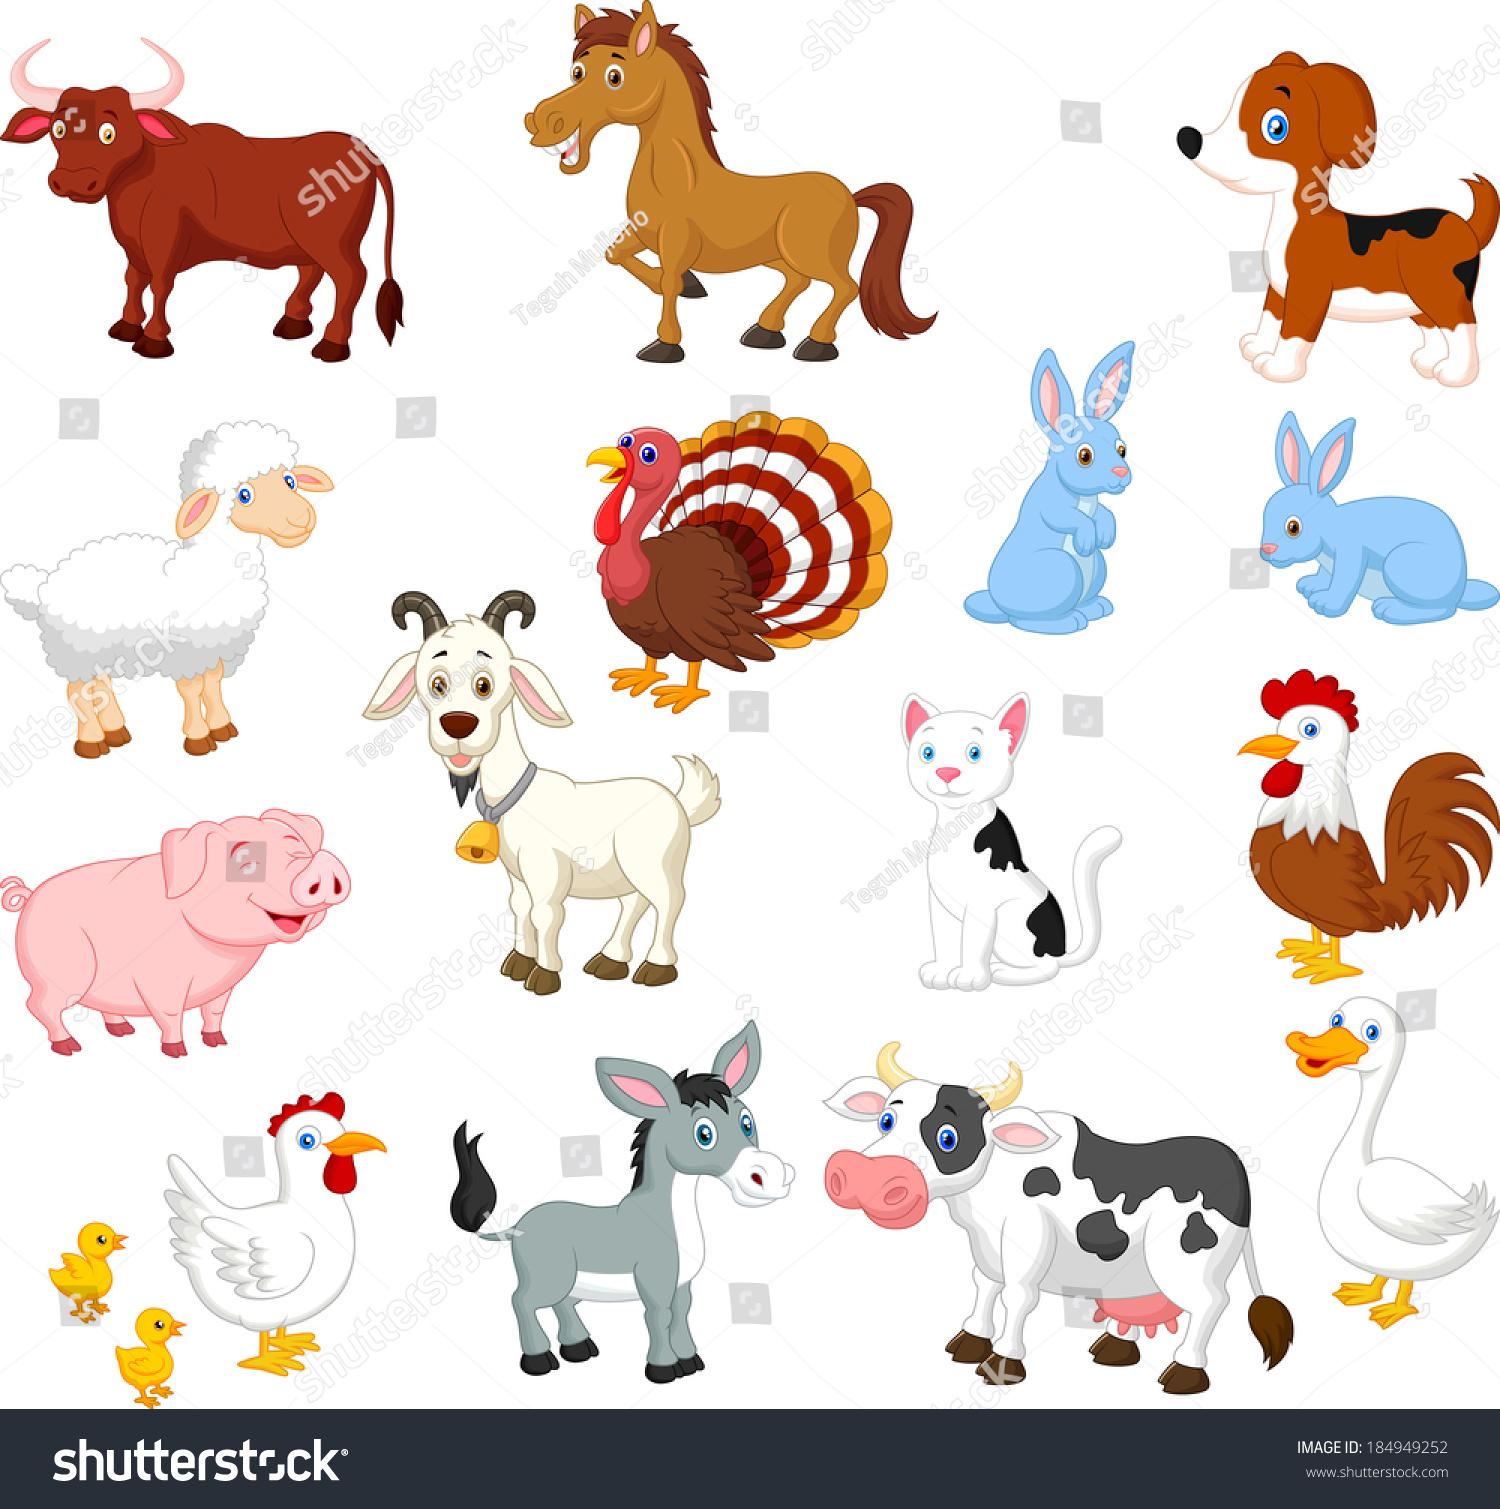 online image   photo editor shutterstock editor farm animal clipart for kids farm animal clipart for kids